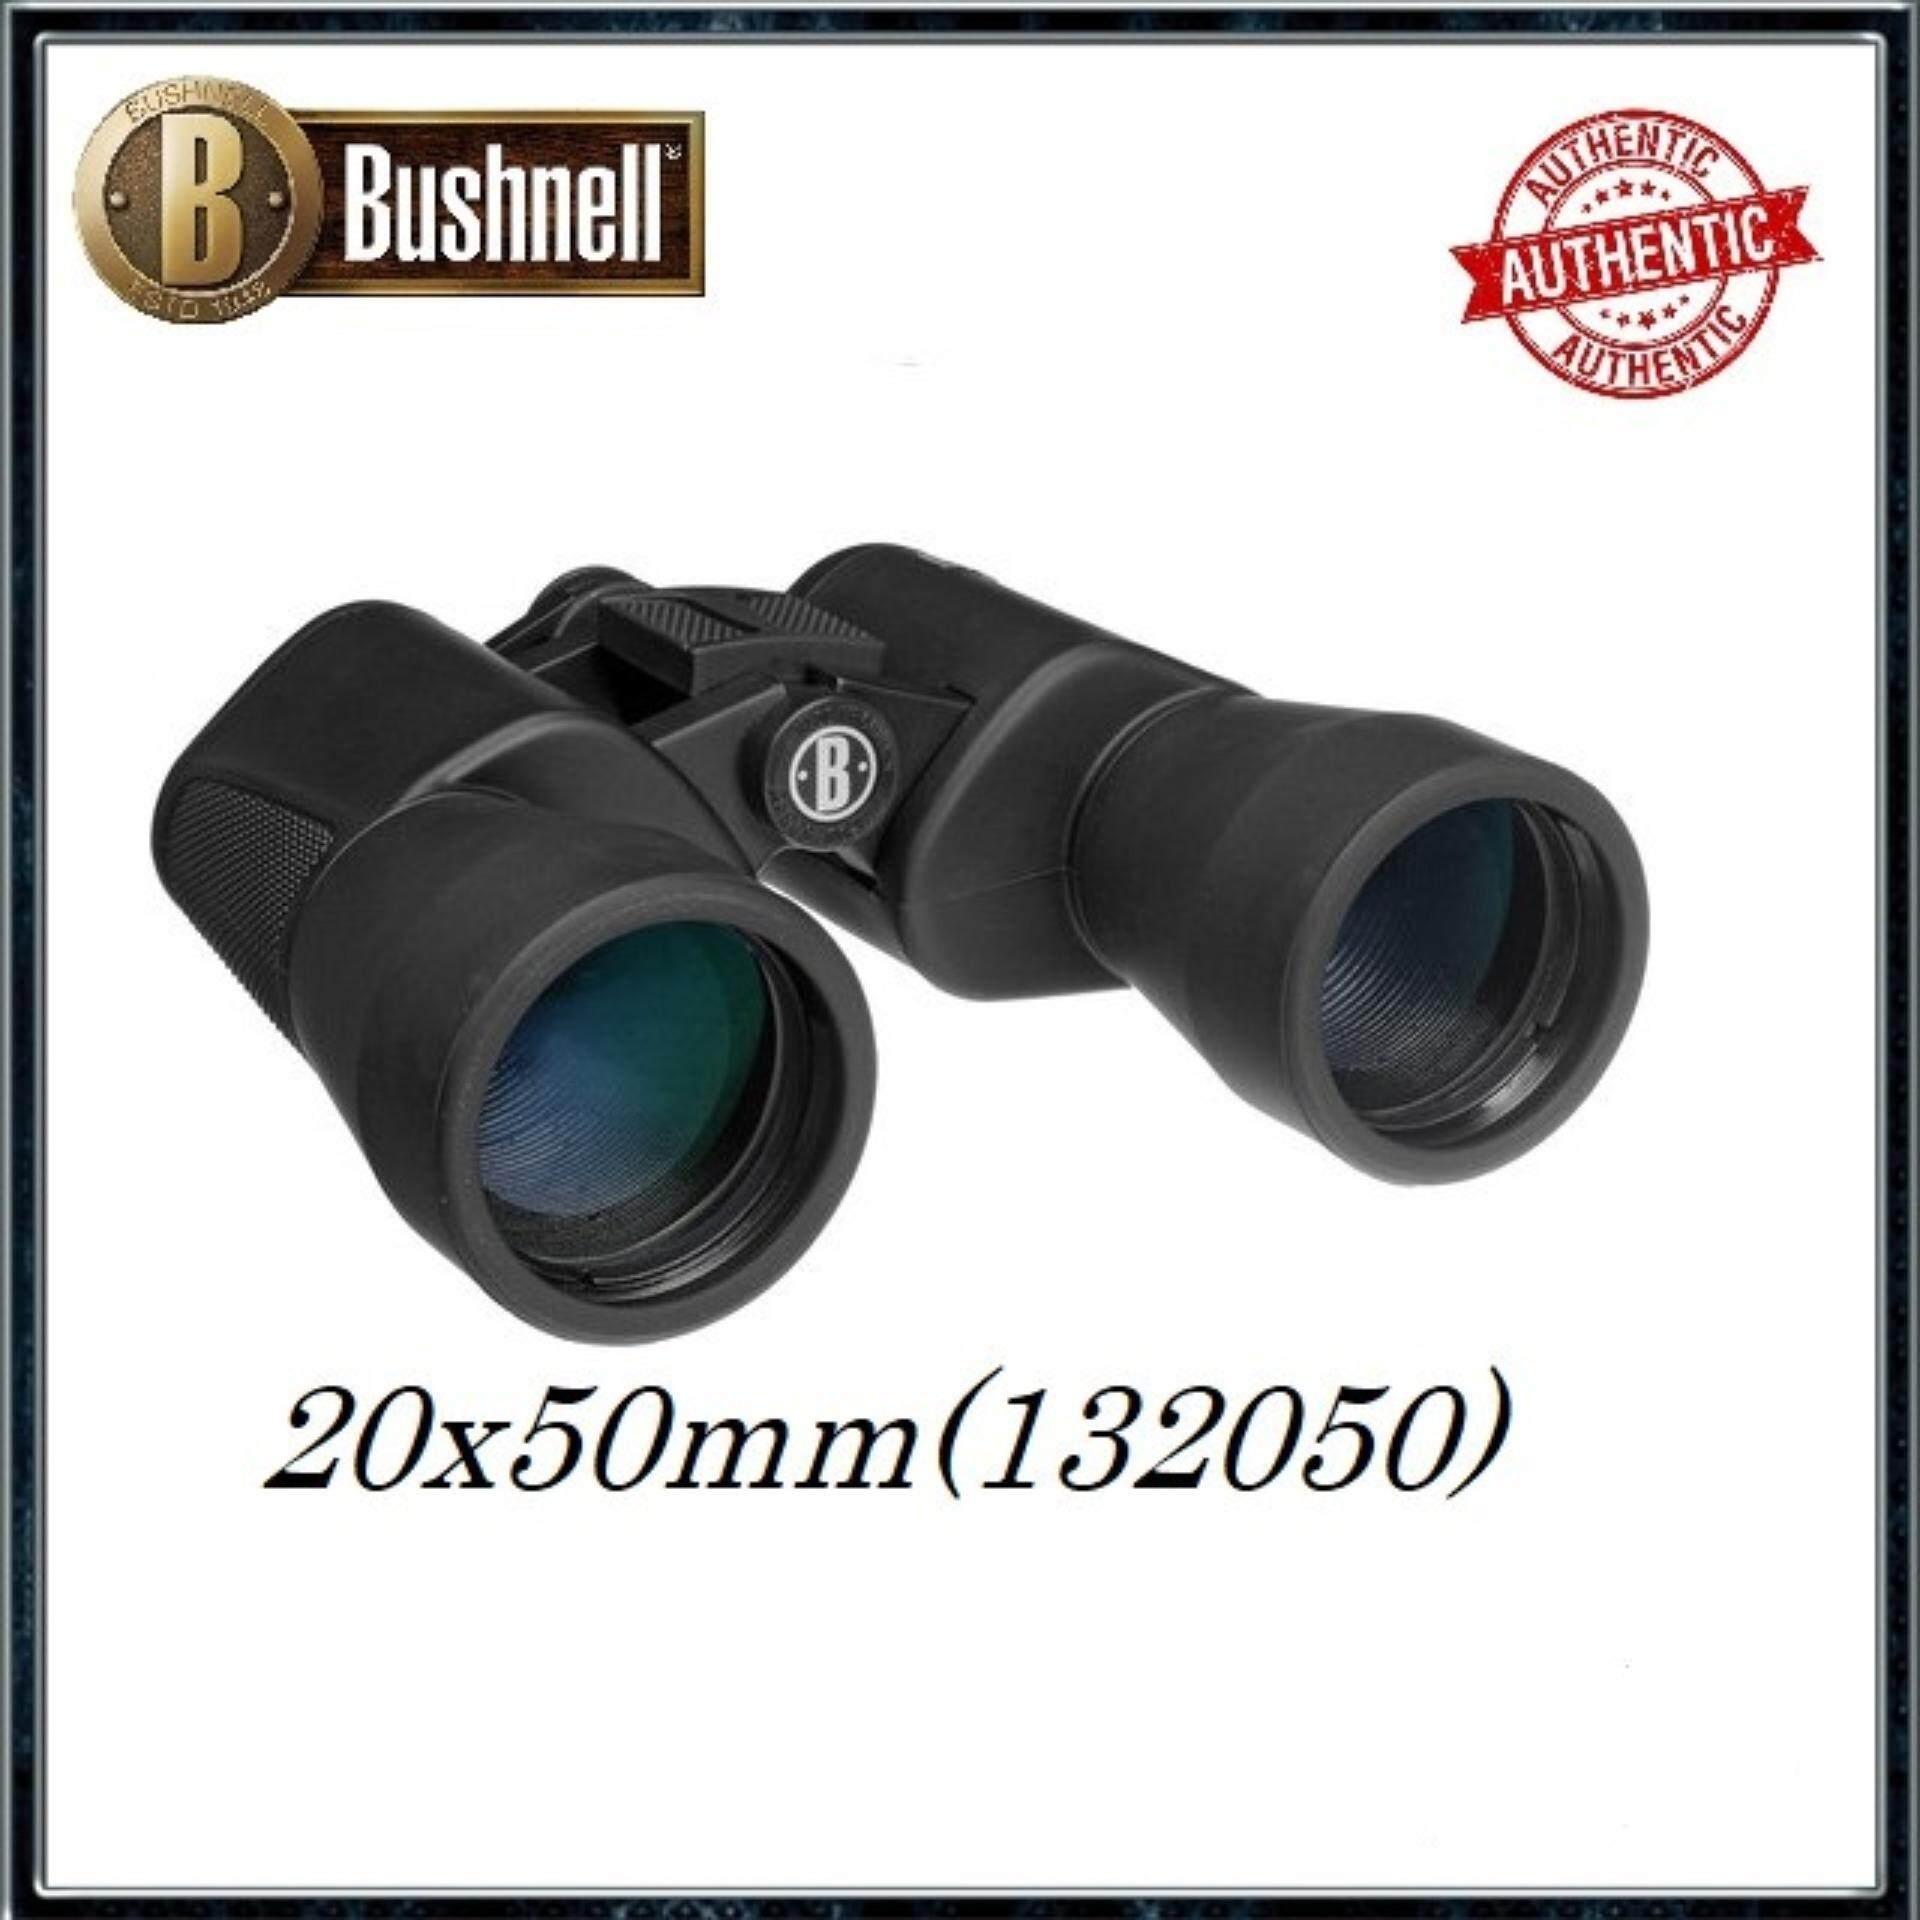 Bushnell Powerview 20x50mm Binocular (132050)